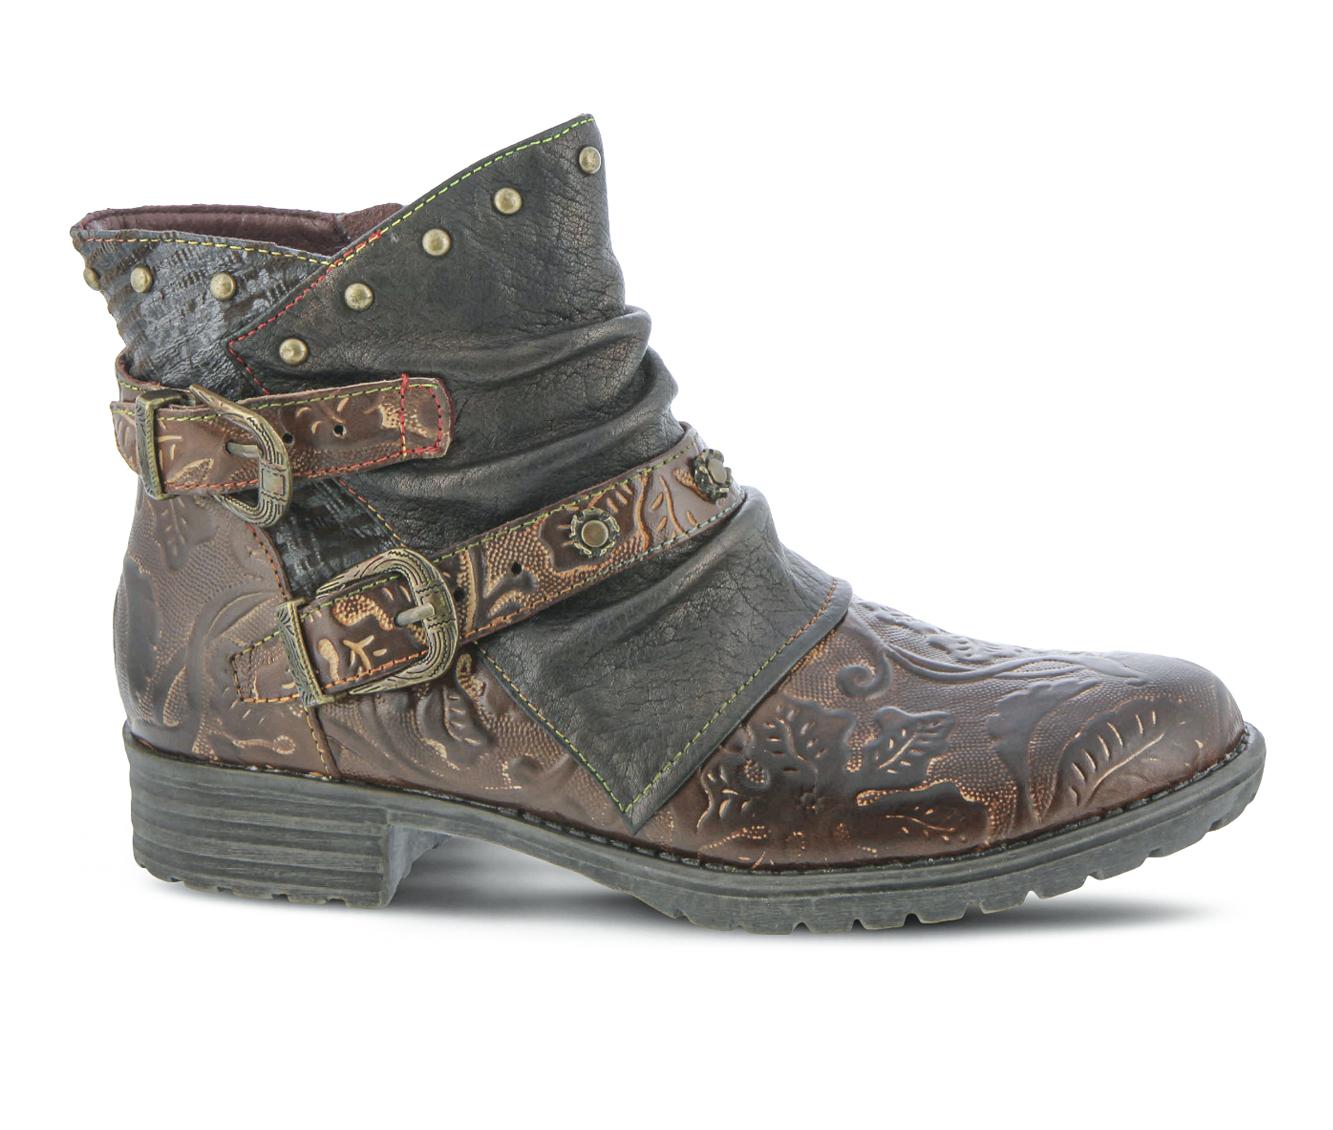 L'Artiste Claudine Women's Boots (Black Leather)